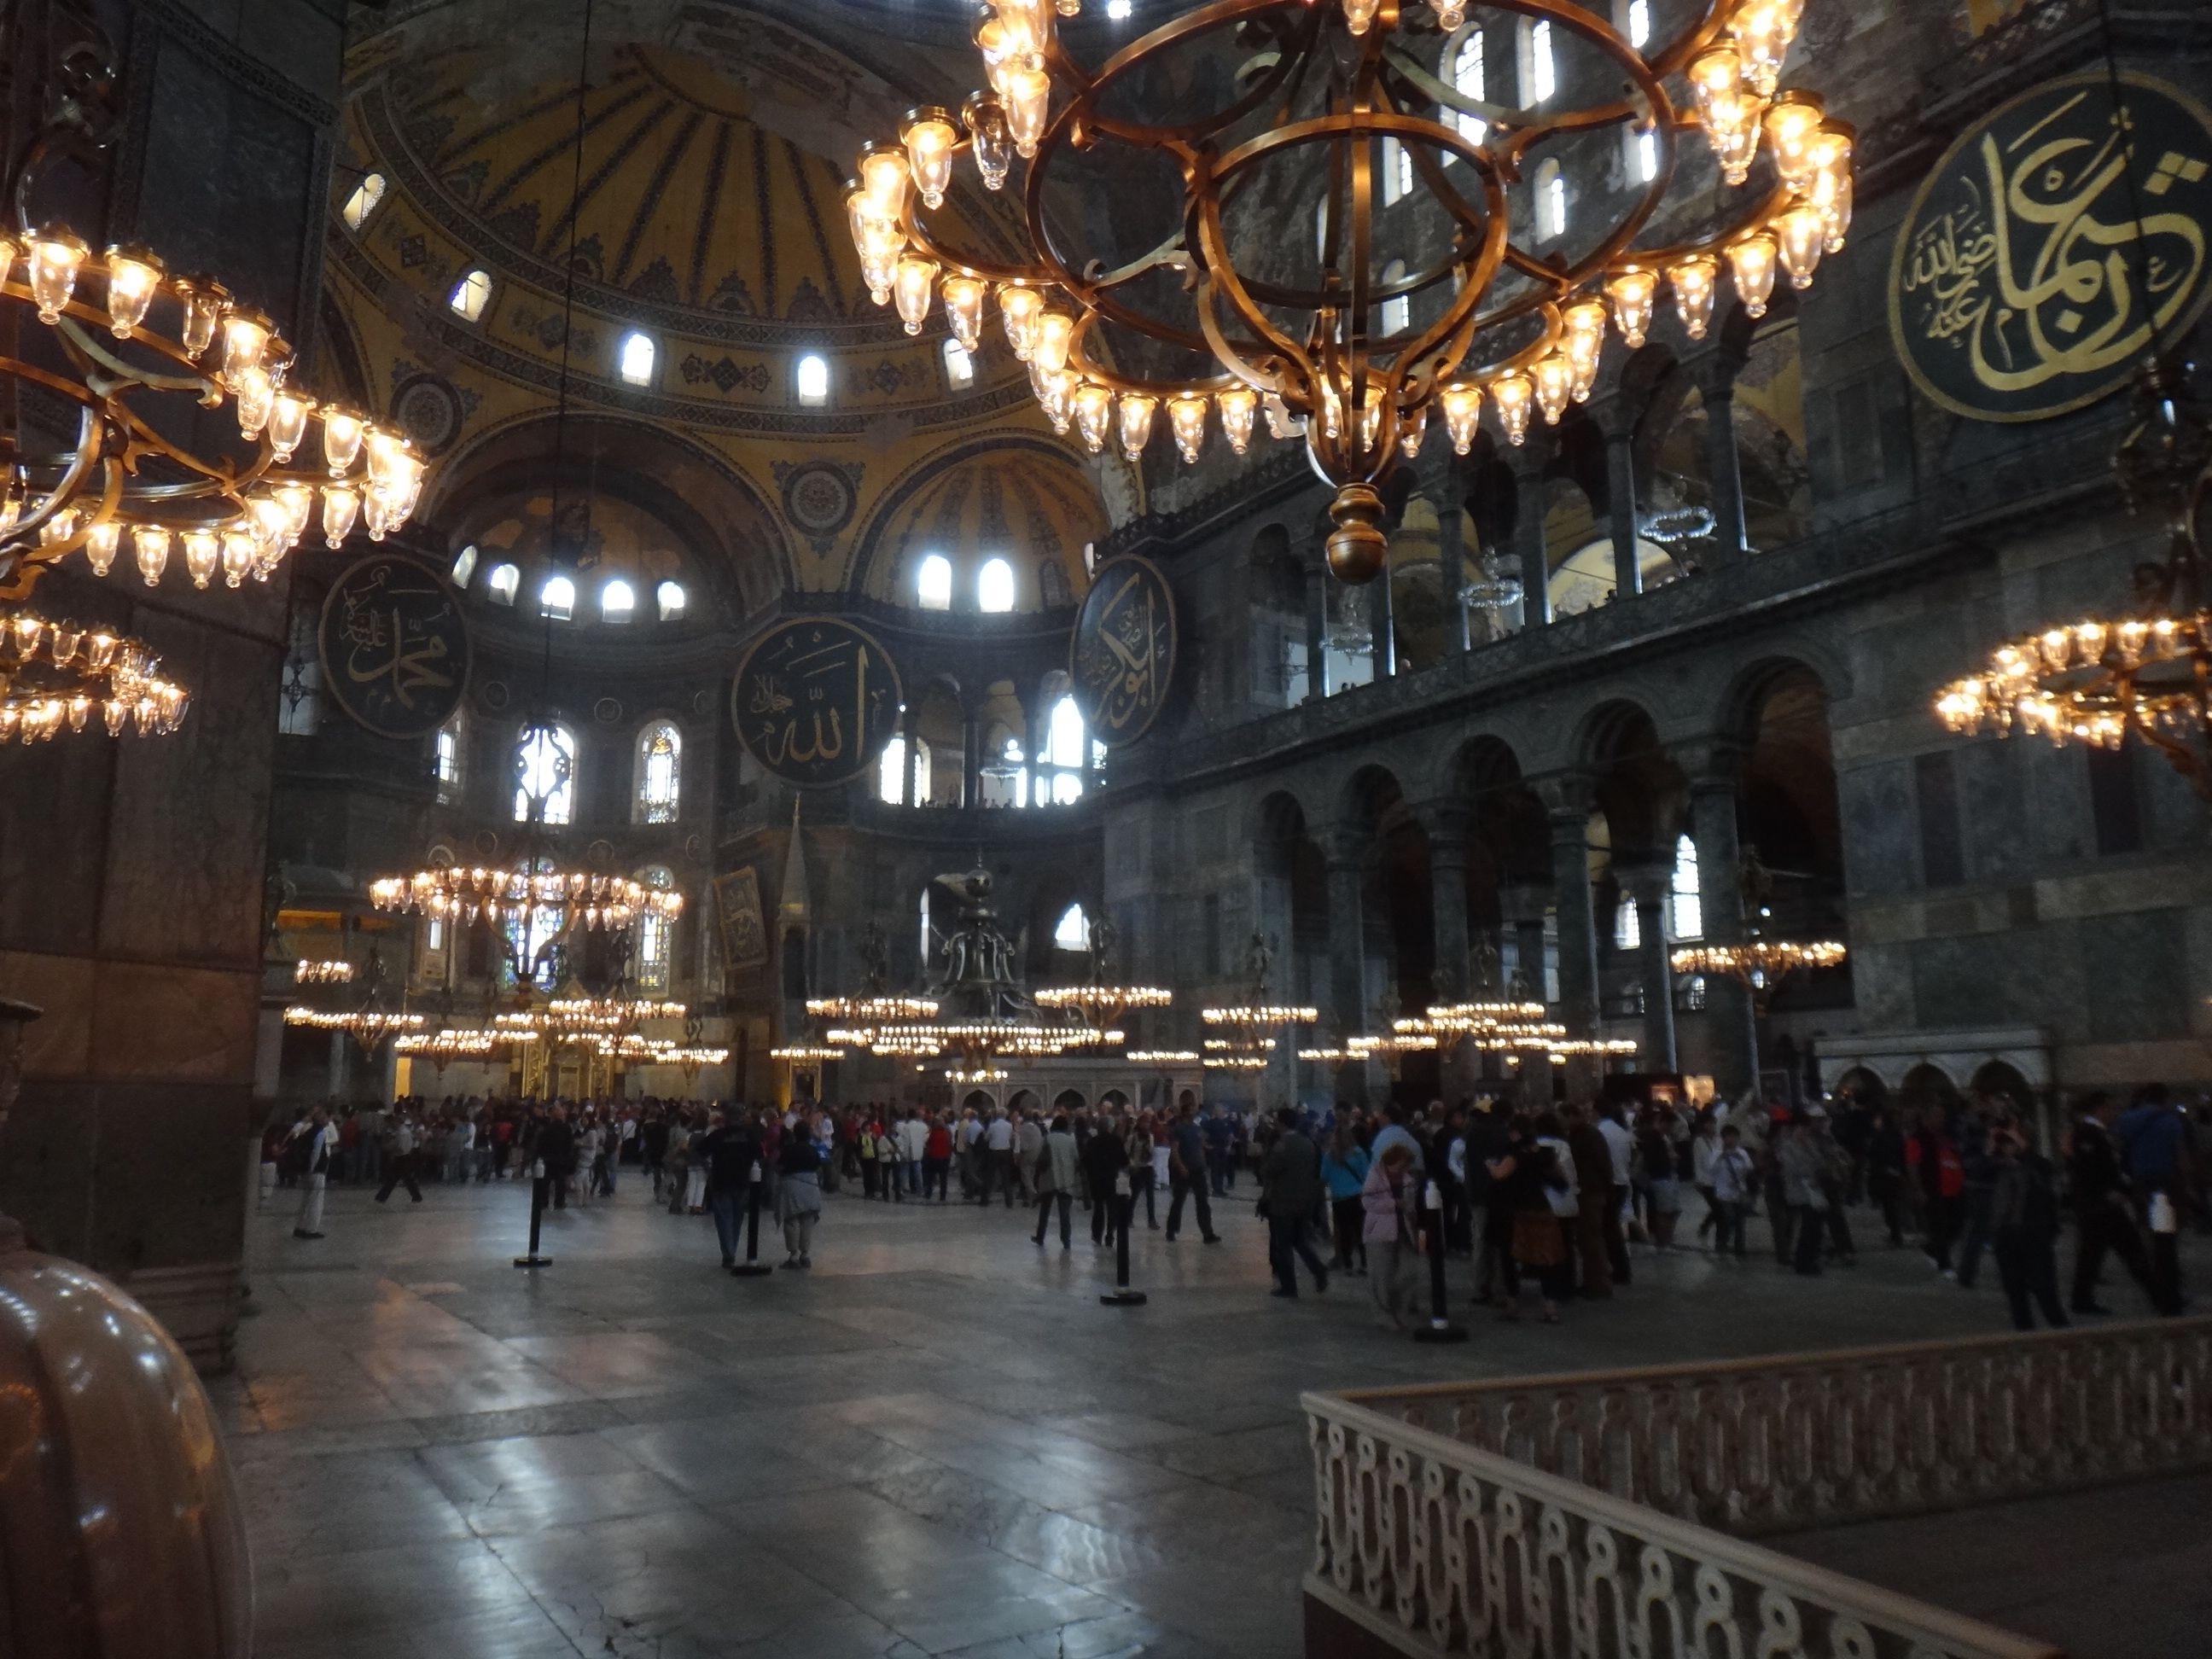 Chandeliers in the Hagia Sophia